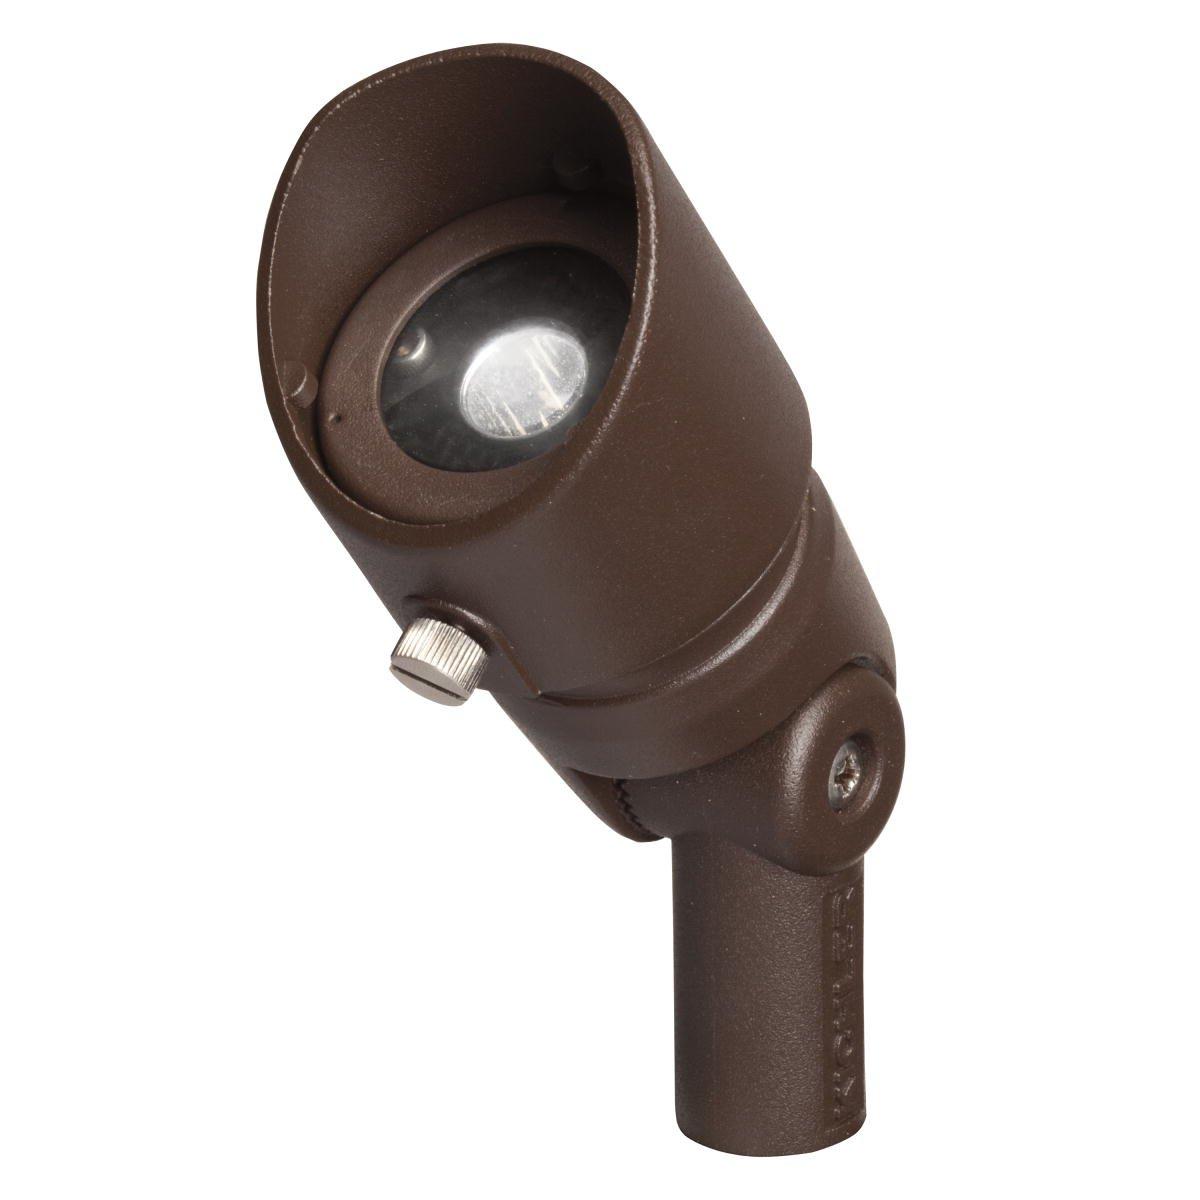 Kichler Lighting 16003AZT27 Landscape Aluminum 12V/4-watt 1-Diode LED 10-Degree Adjustable Spot Light, Textured Architectural Bronze